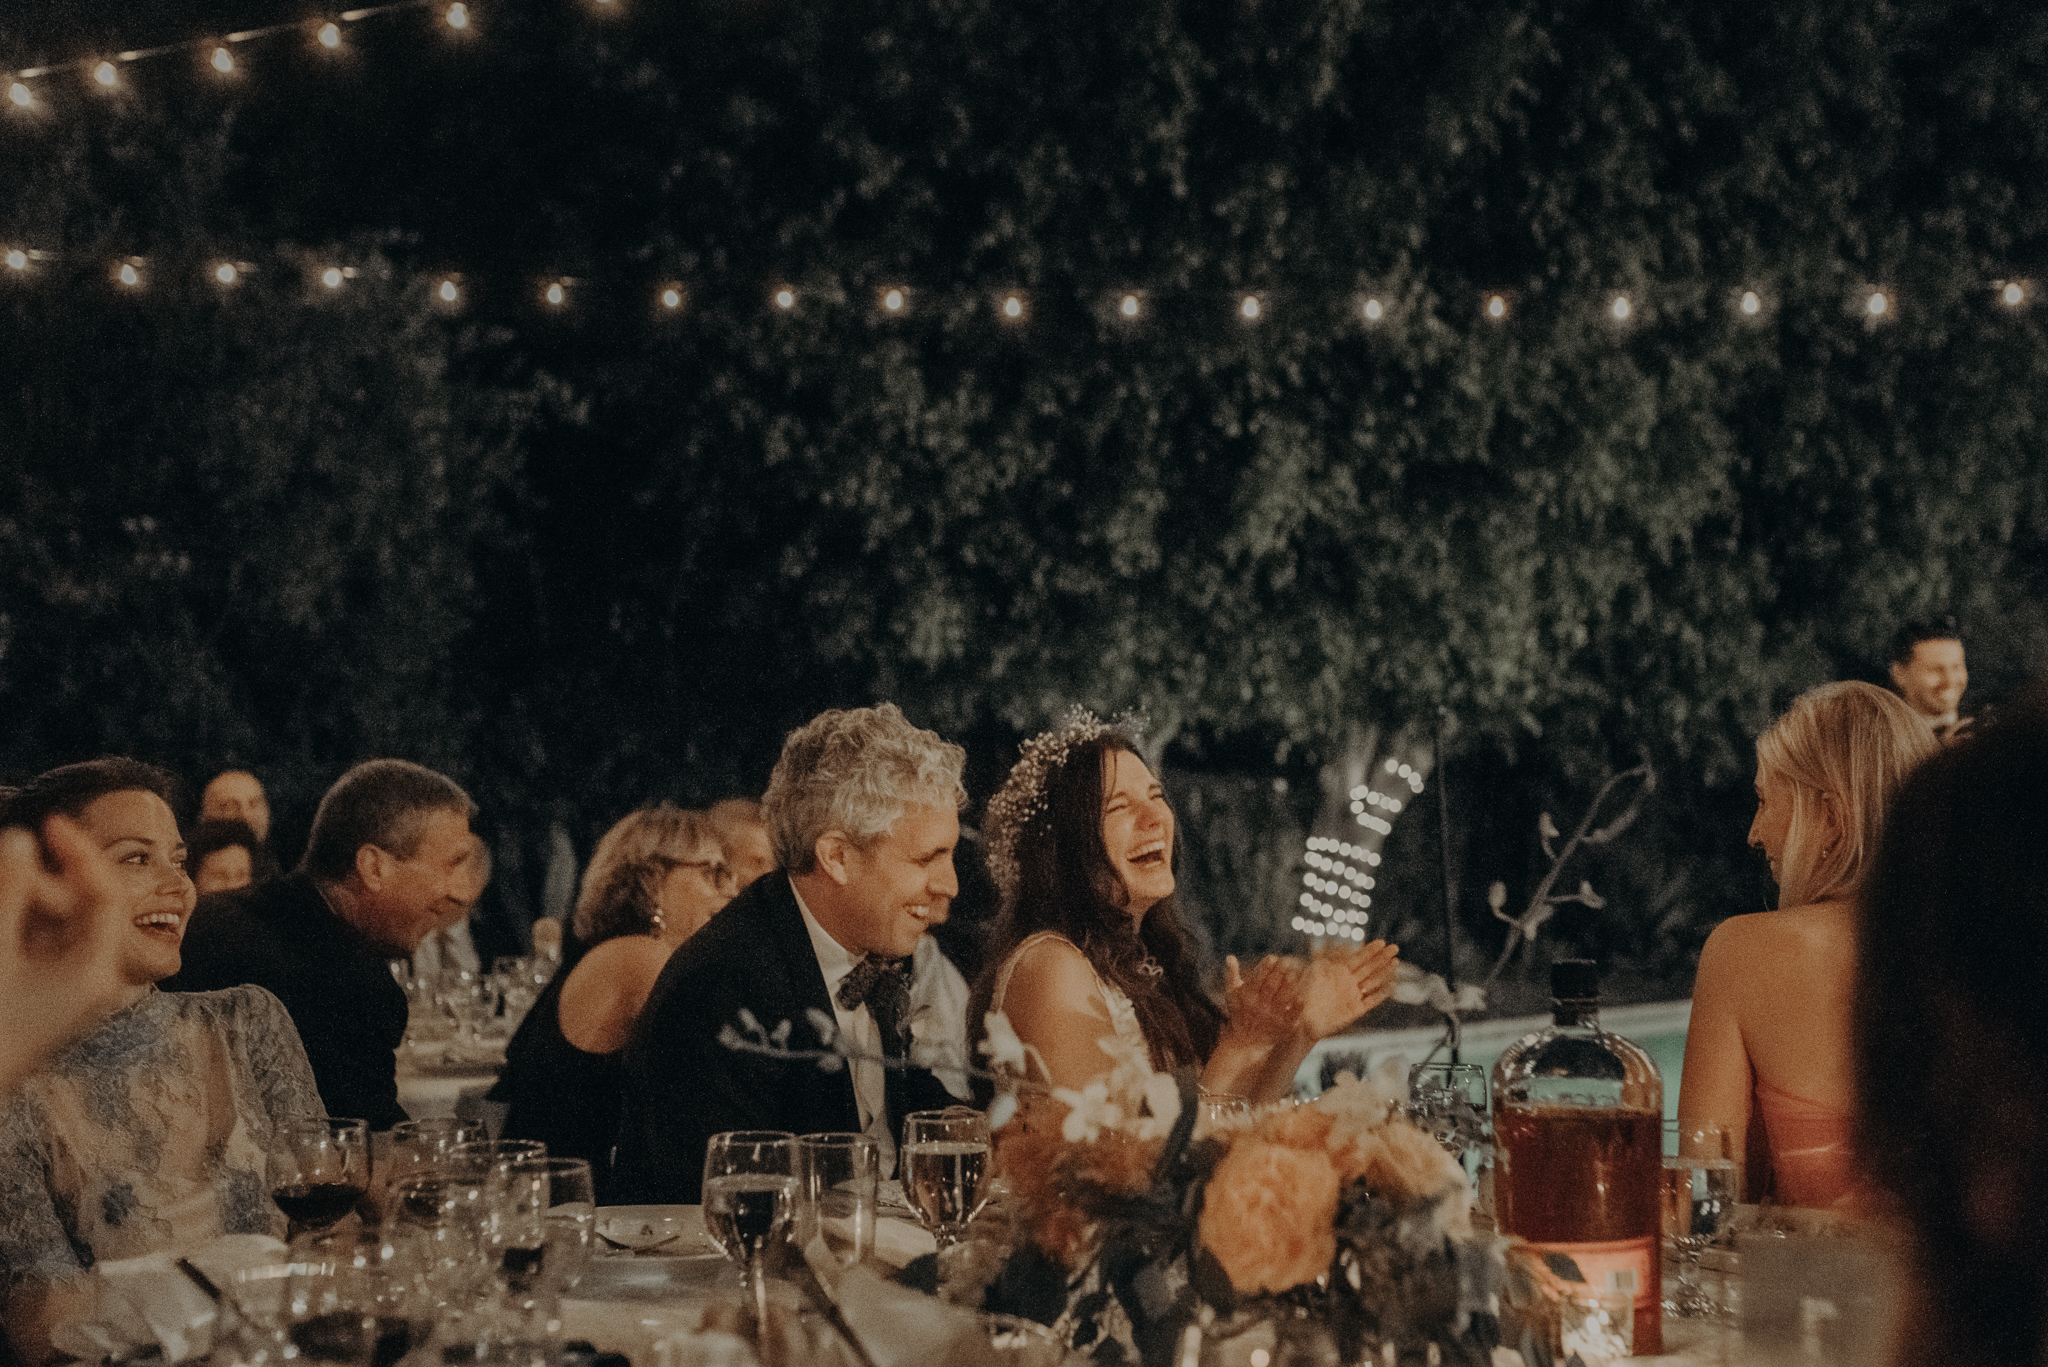 Isaiah + Taylor Photography - Private Estate Backyard Wedding - Beverly Hills - Los Angeles Wedding Photographer - 138.jpg